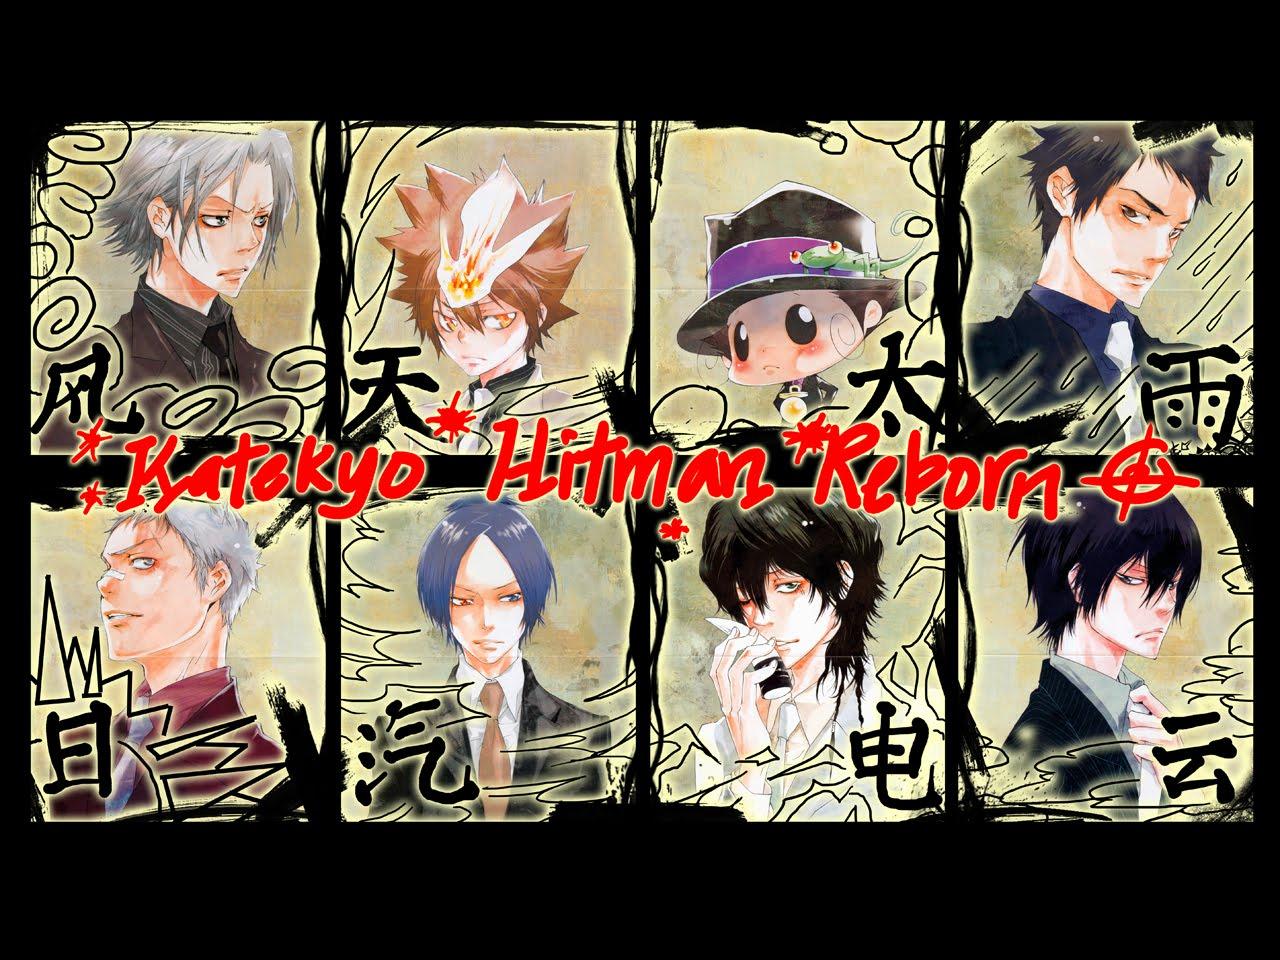 http://2.bp.blogspot.com/_yt6rZiXQUtw/S-Imz0AS_jI/AAAAAAAASk8/QDpyDQJ9kuE/S1600-R/Katekyo_Hitman_Reborn_WP_ver2_by_piku_chan.jpg